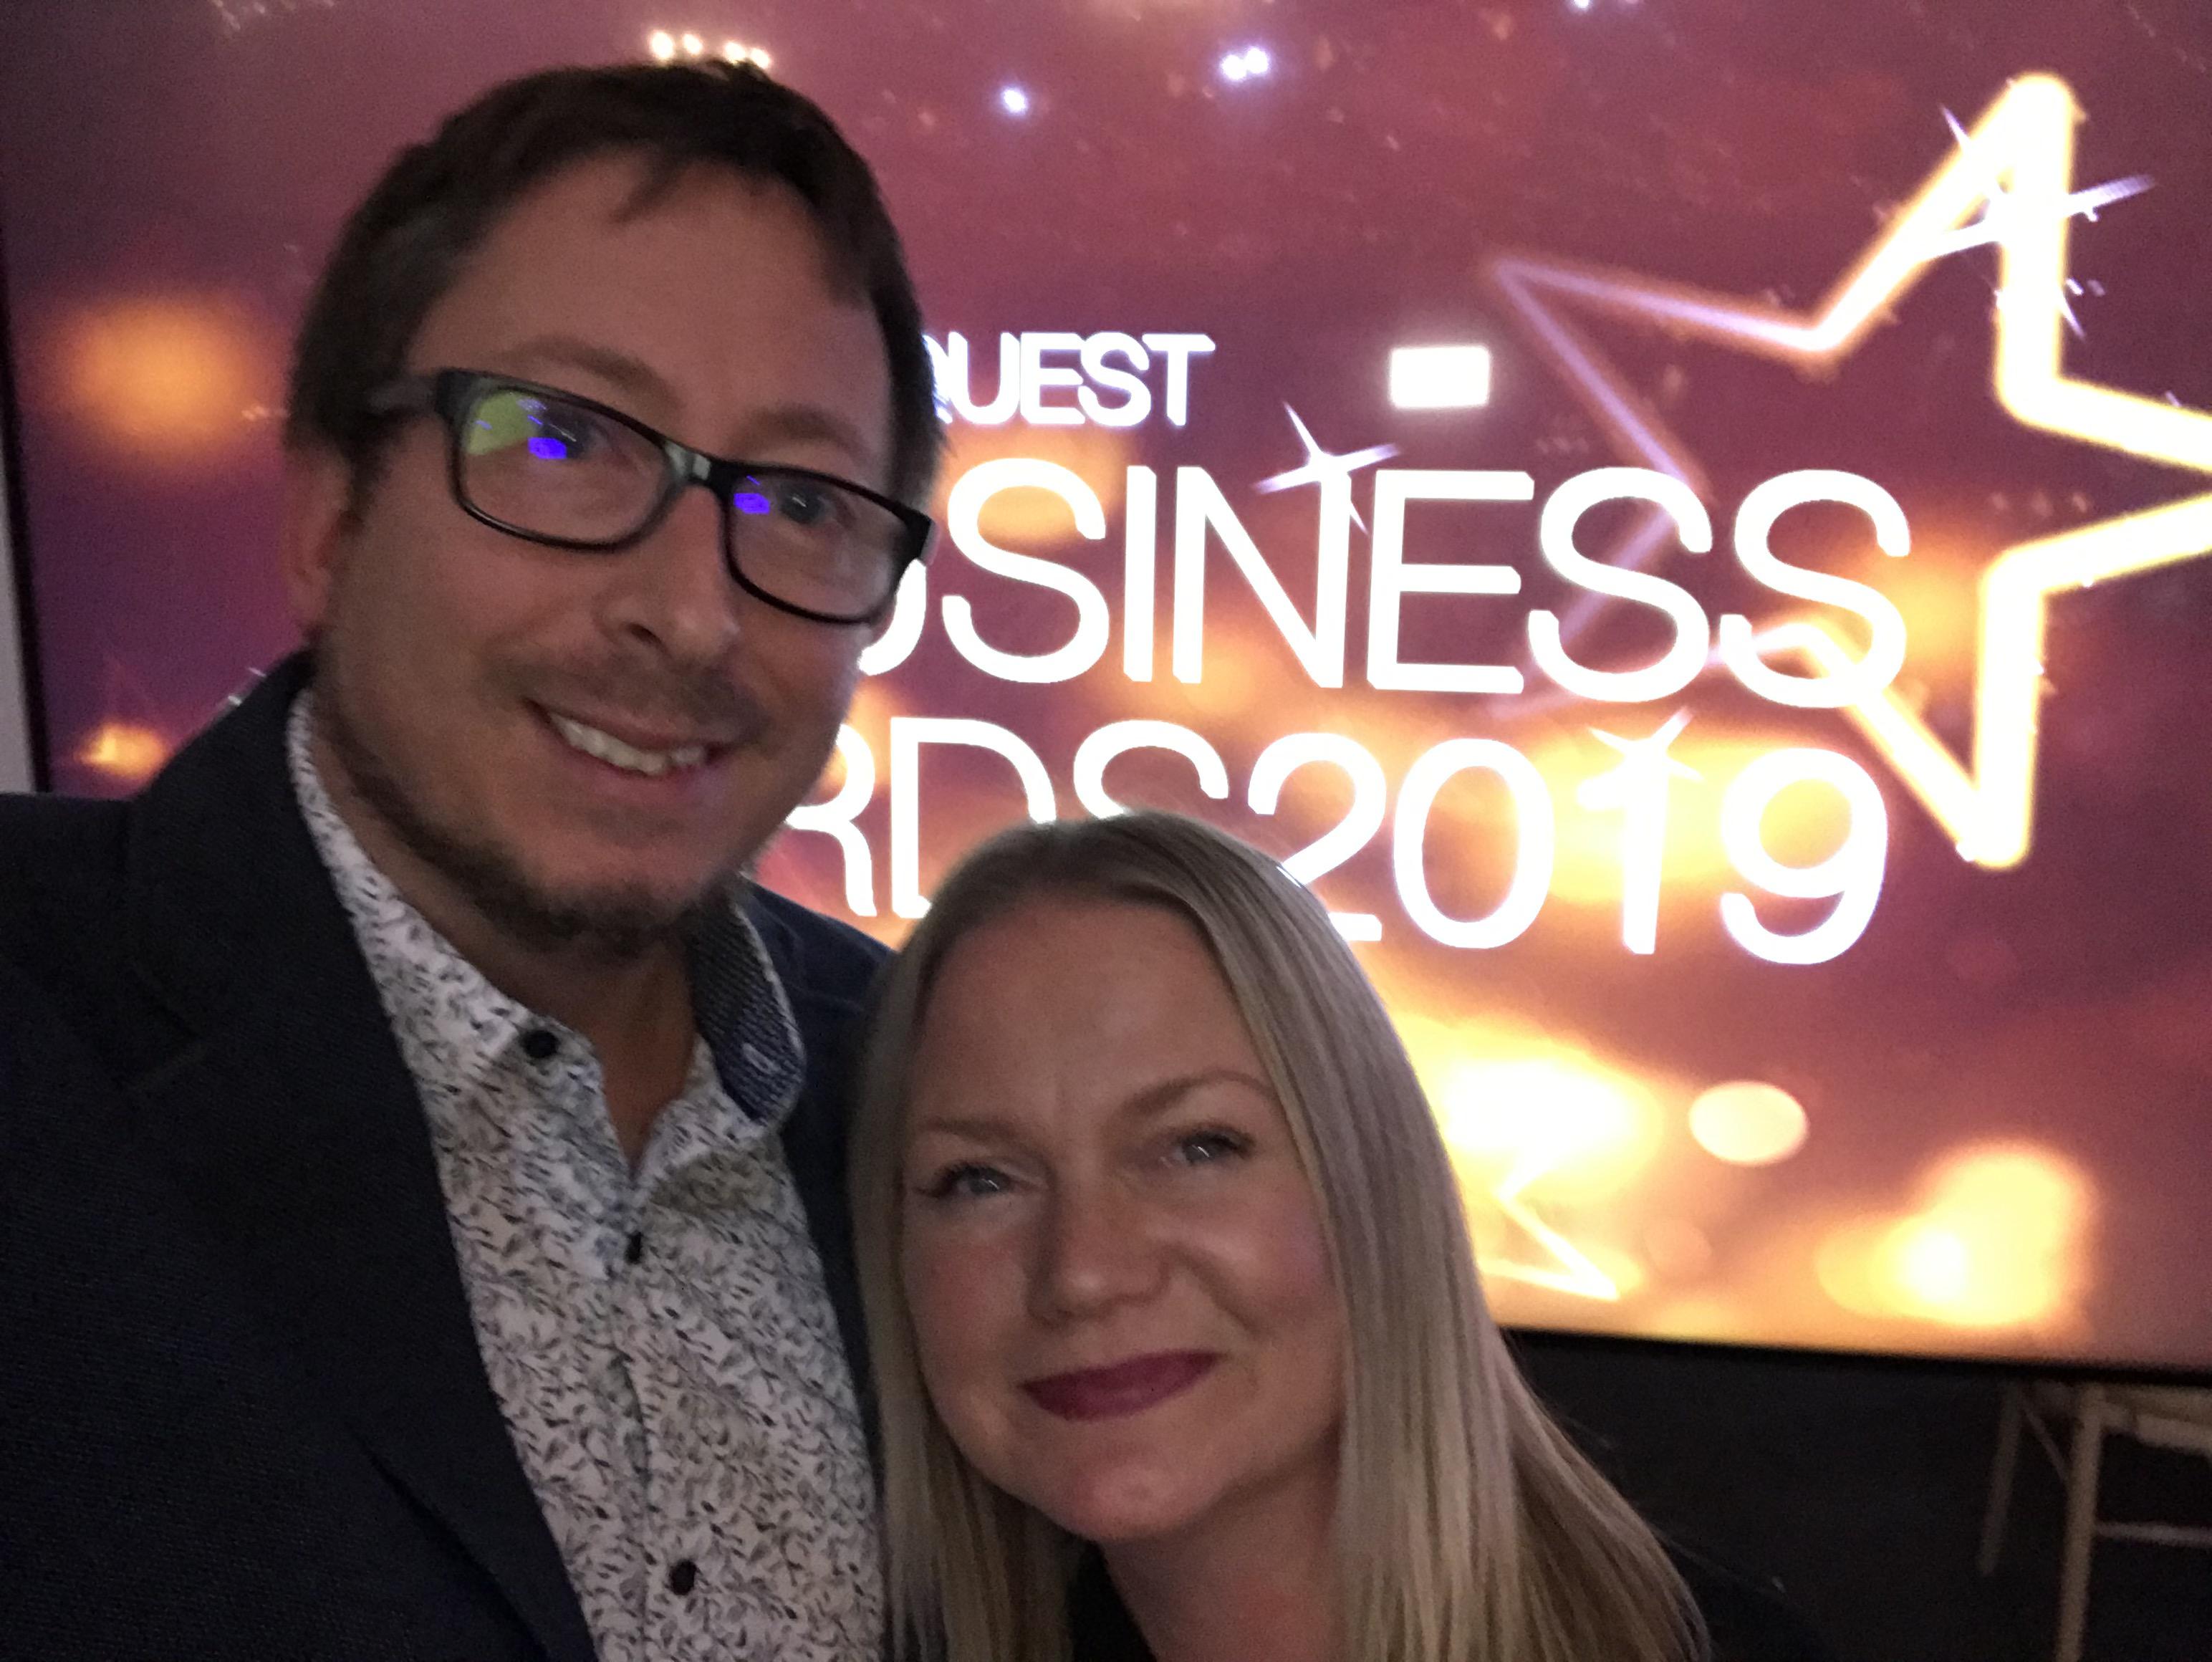 Ben Stanbury Prosper Award winners